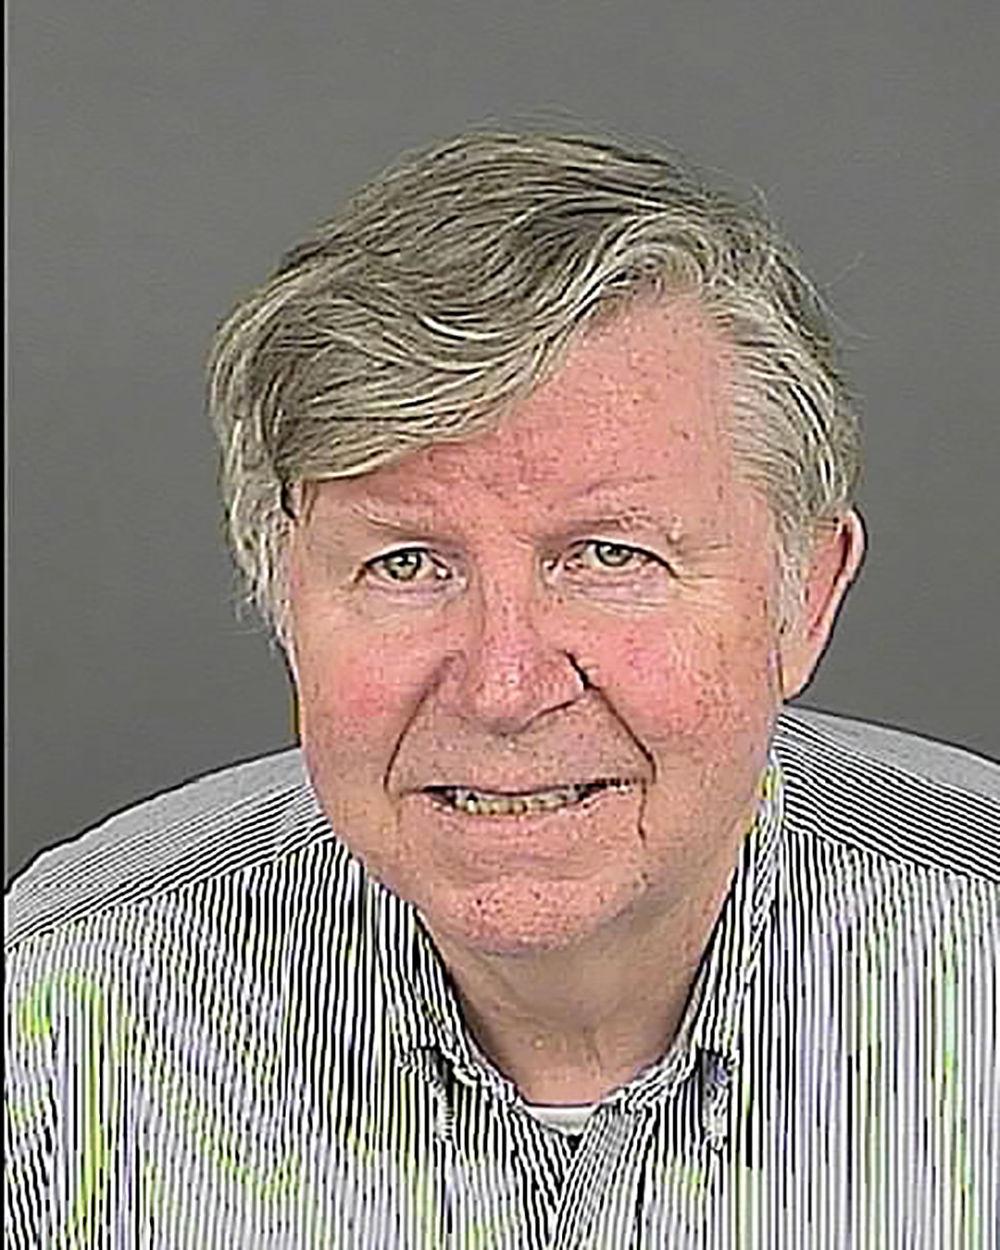 Douglas Bruce booking mugshot Friday, March 11, 2016